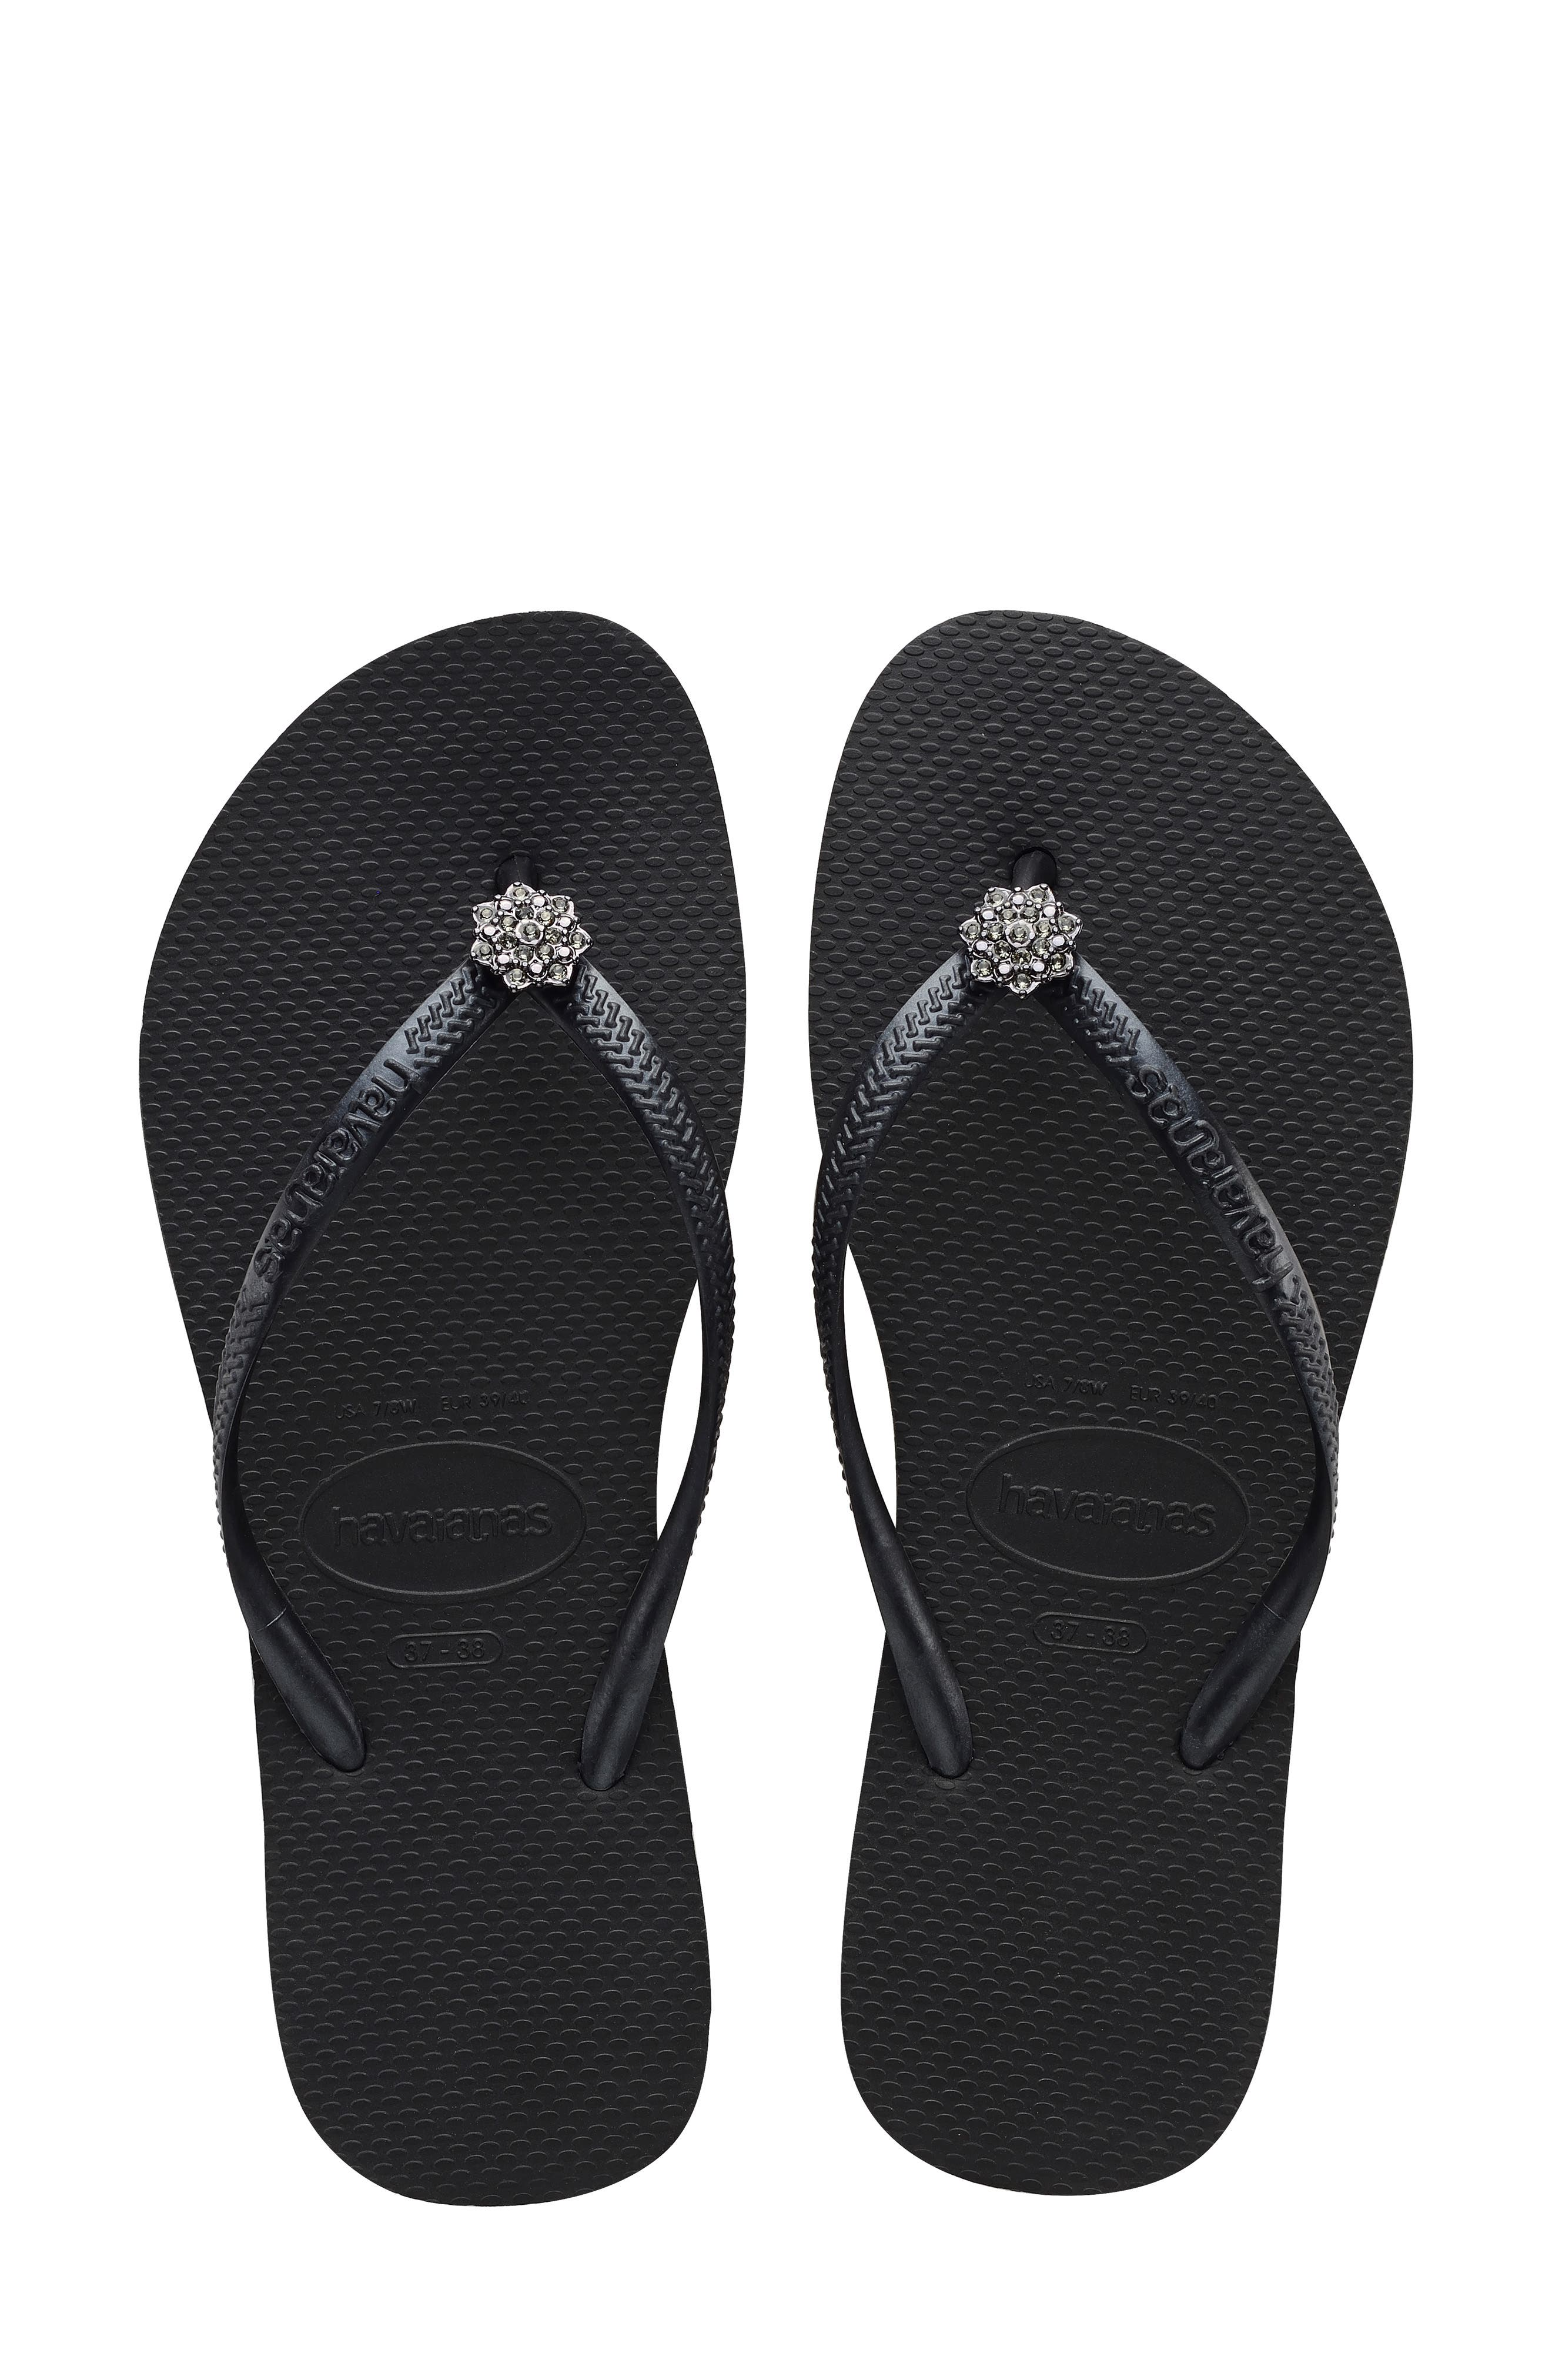 5bc5d51bf Women s Havaianas Sandals